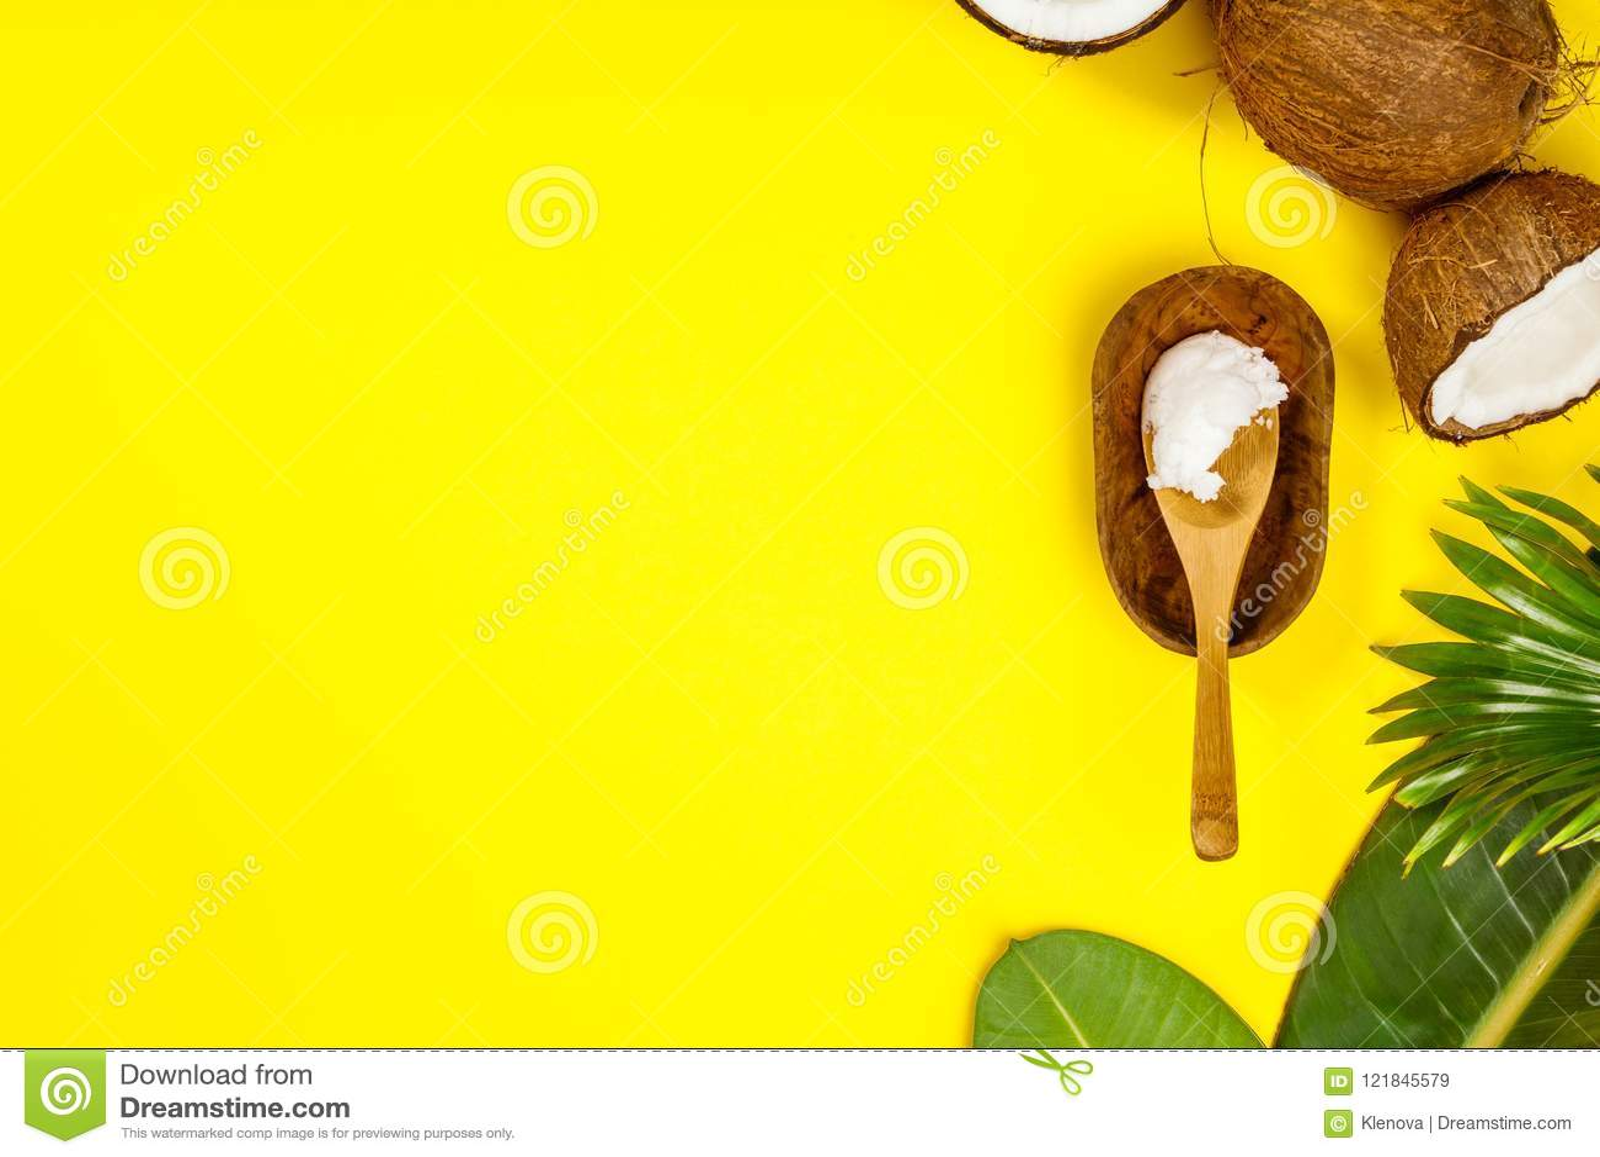 Kokosnotenolie, tropische bladeren en verse kokosnoten